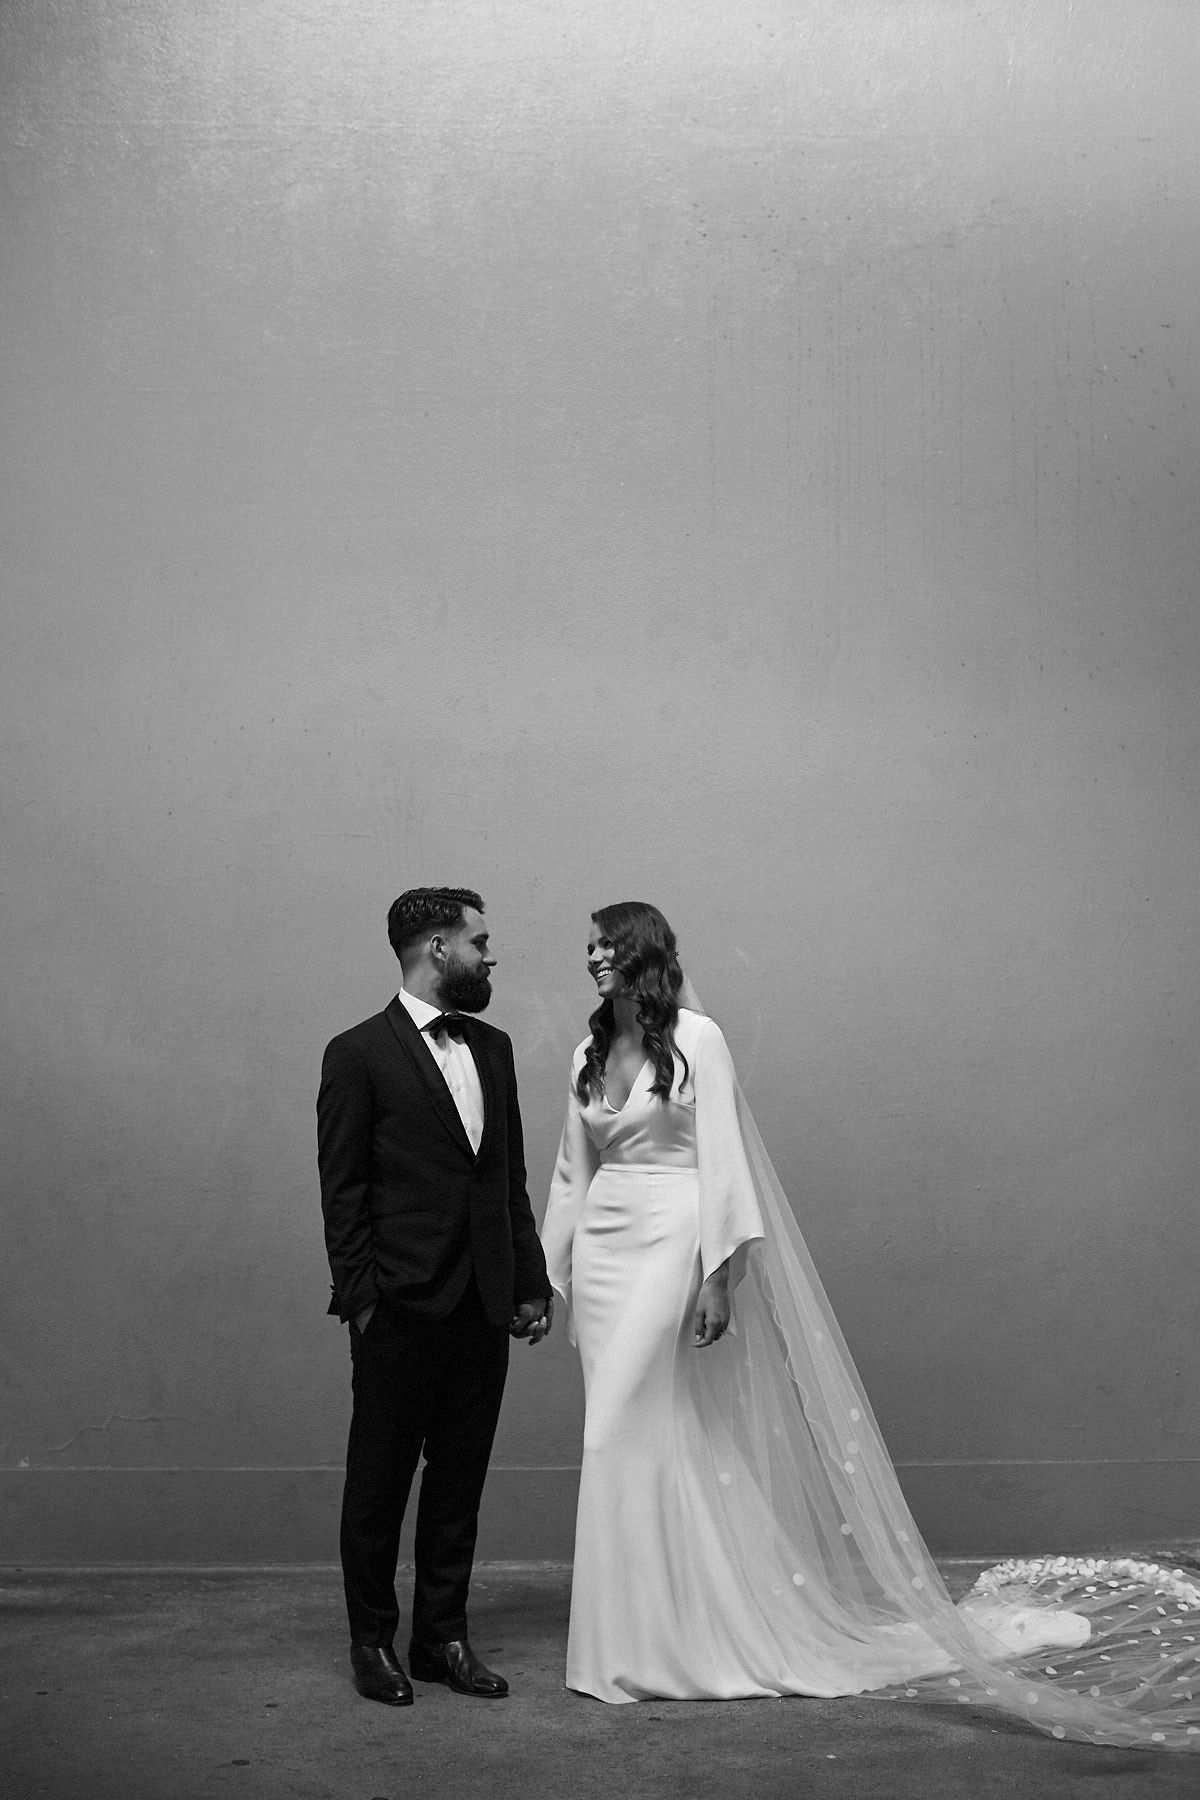 TheLovedOnes-Michelle&Jackson-24Nov18-296.jpg